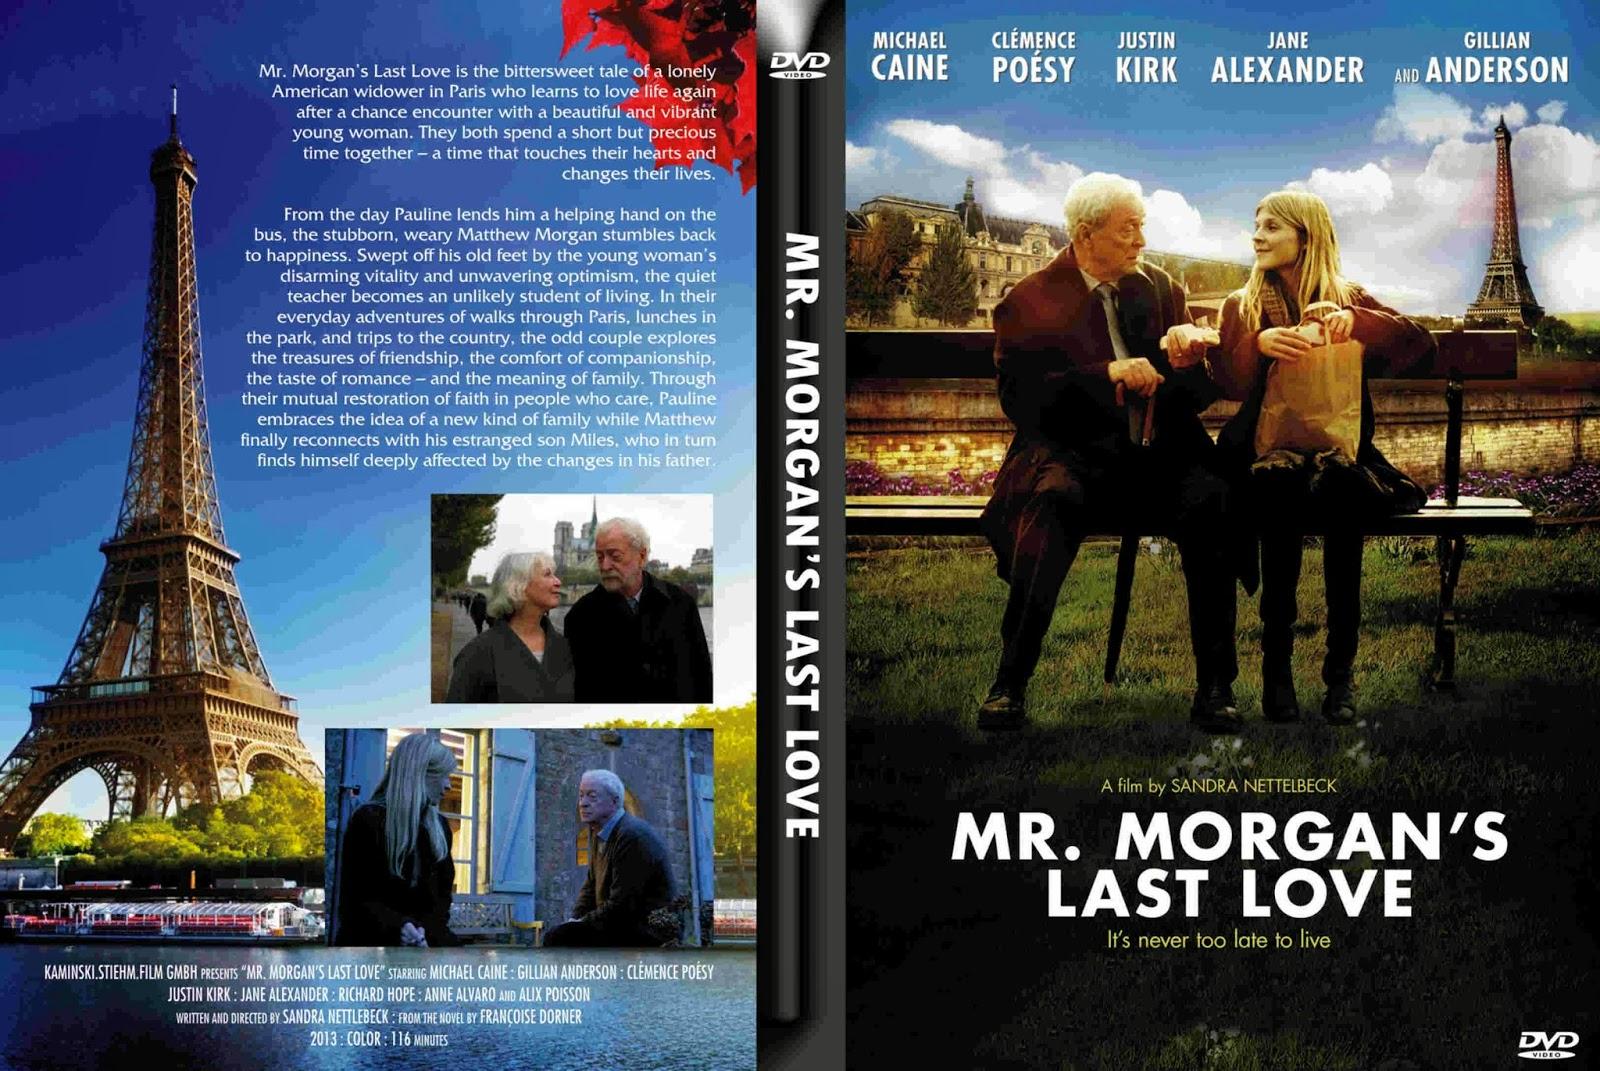 http://3.bp.blogspot.com/-VdYeGrCPlck/Ul7hOXr9ozI/AAAAAAAAYJc/8vU3XC2xabo/s1600/Mr.+Morgan%27s+Last+Love+(2013)+R0+-+Cover+DVD+Movie.jpg